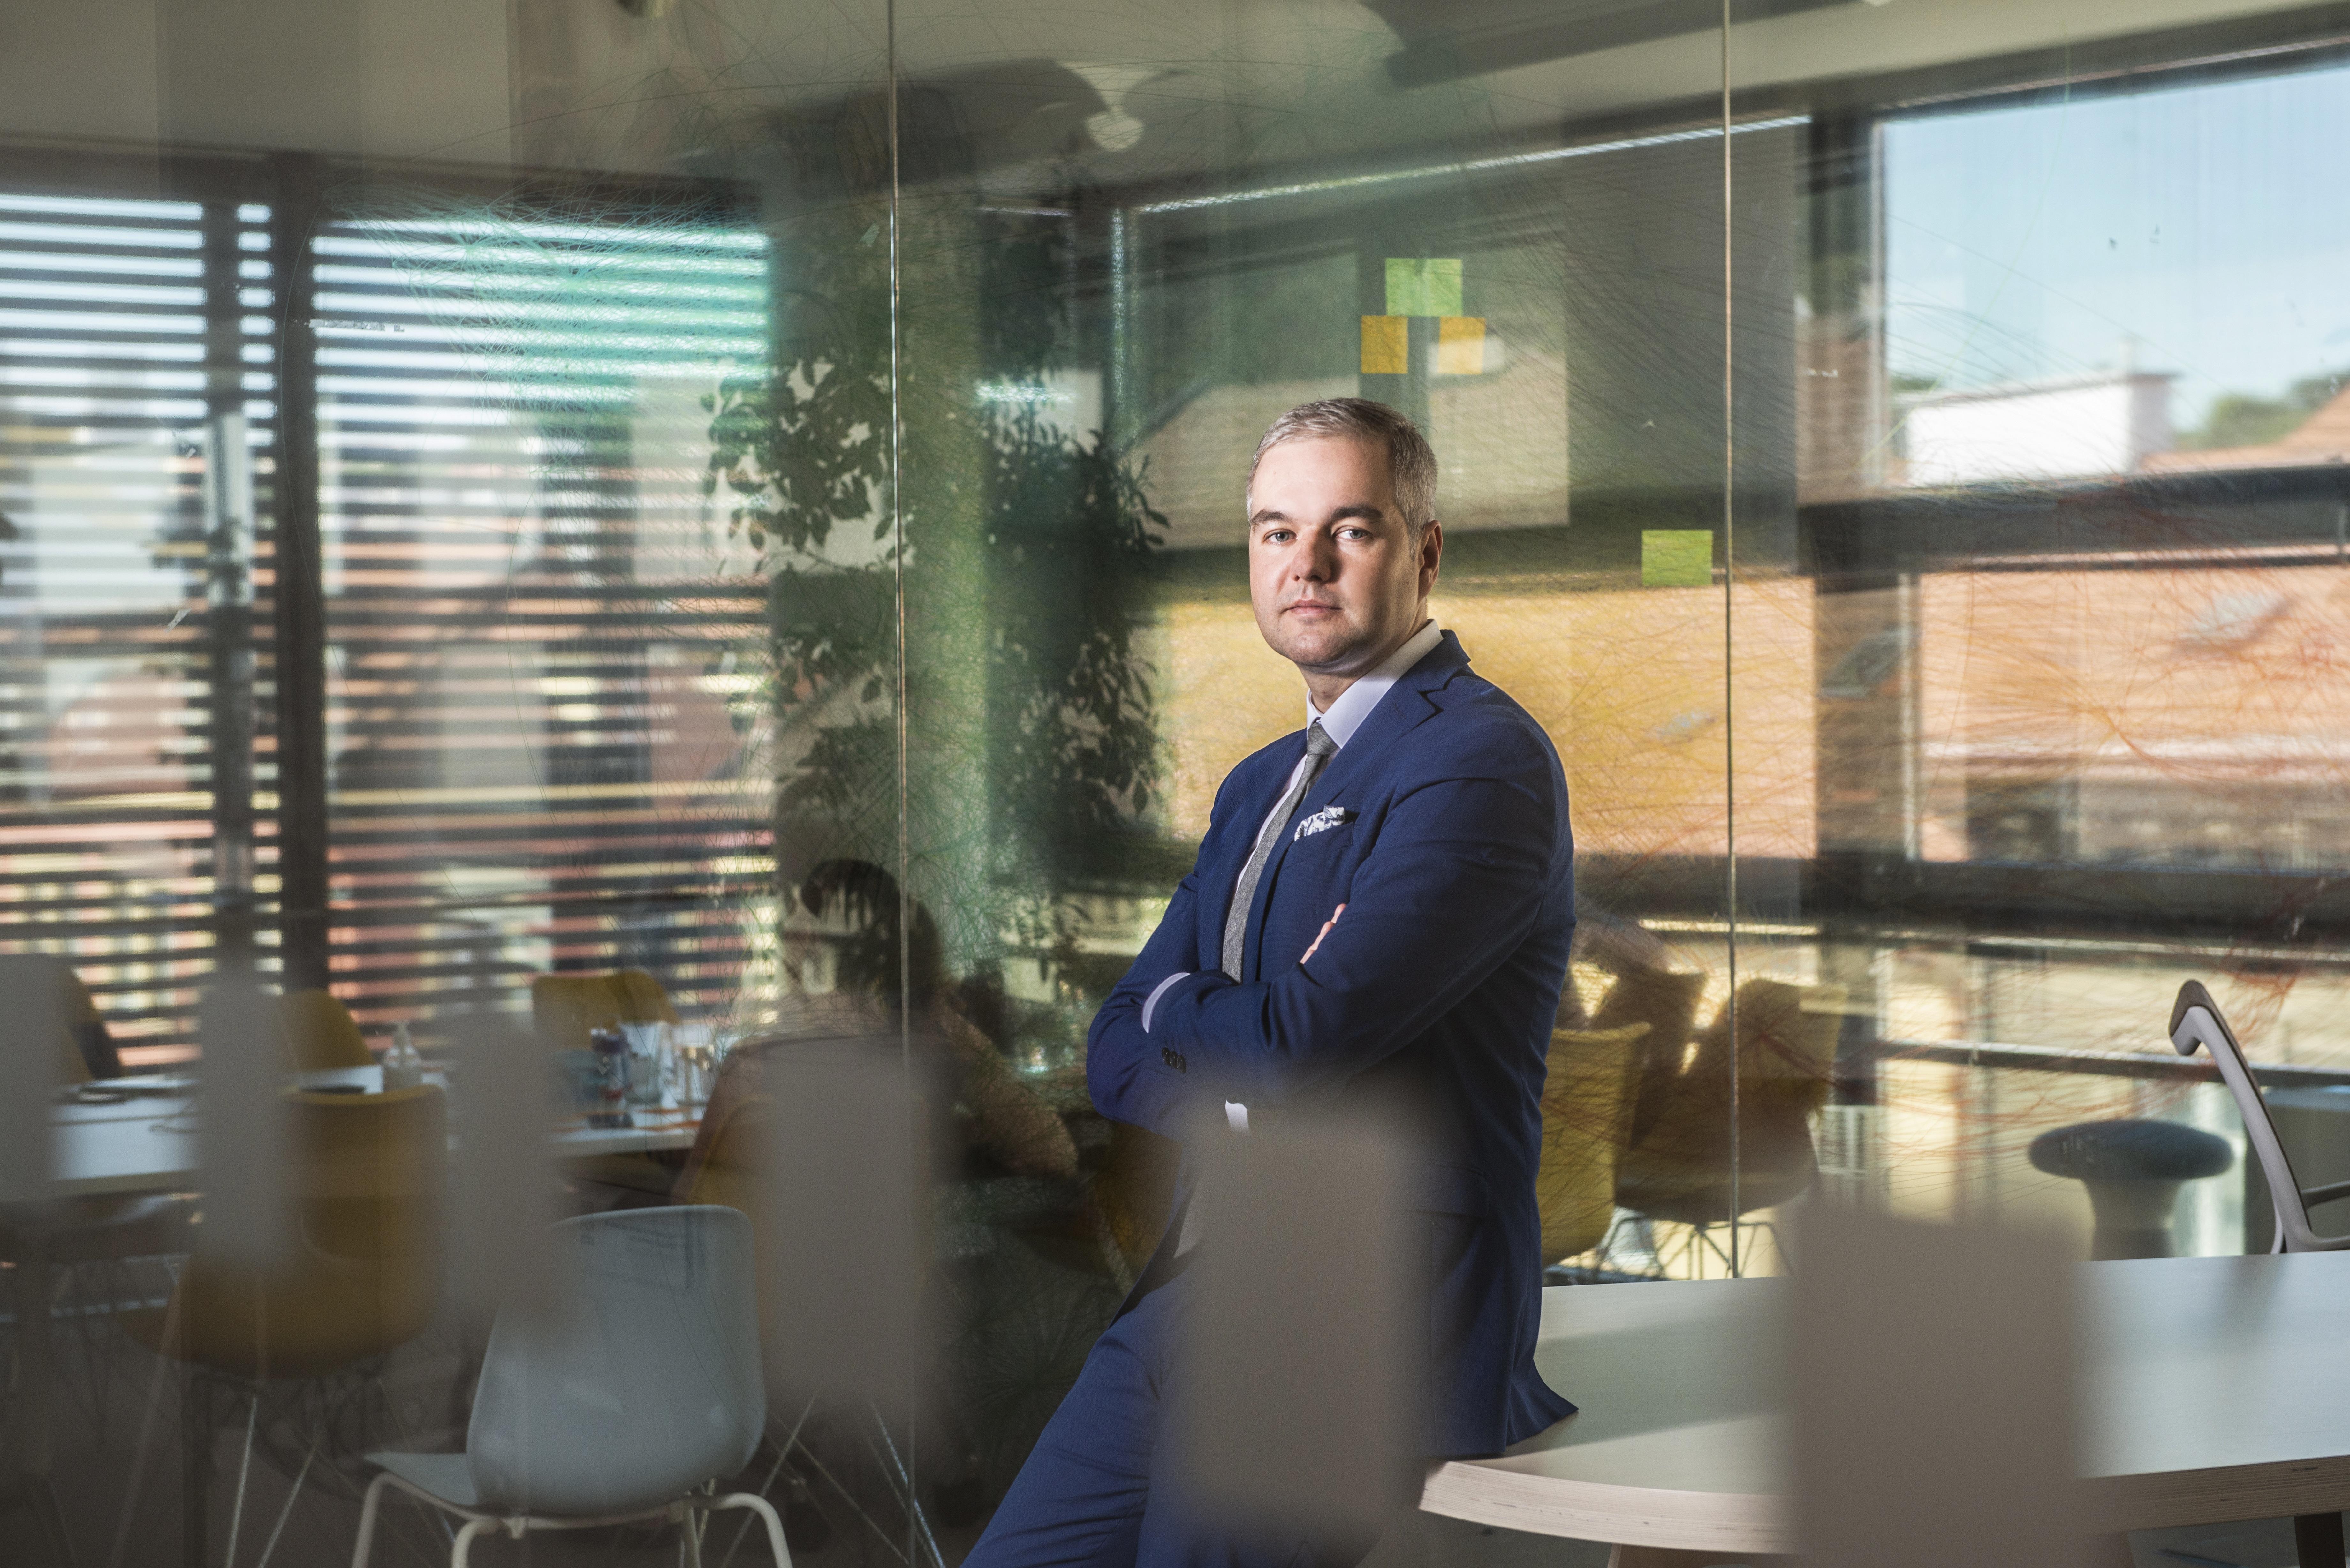 Rozhovor s Petrem Volným, spoluzakladatelem platformy Upvest